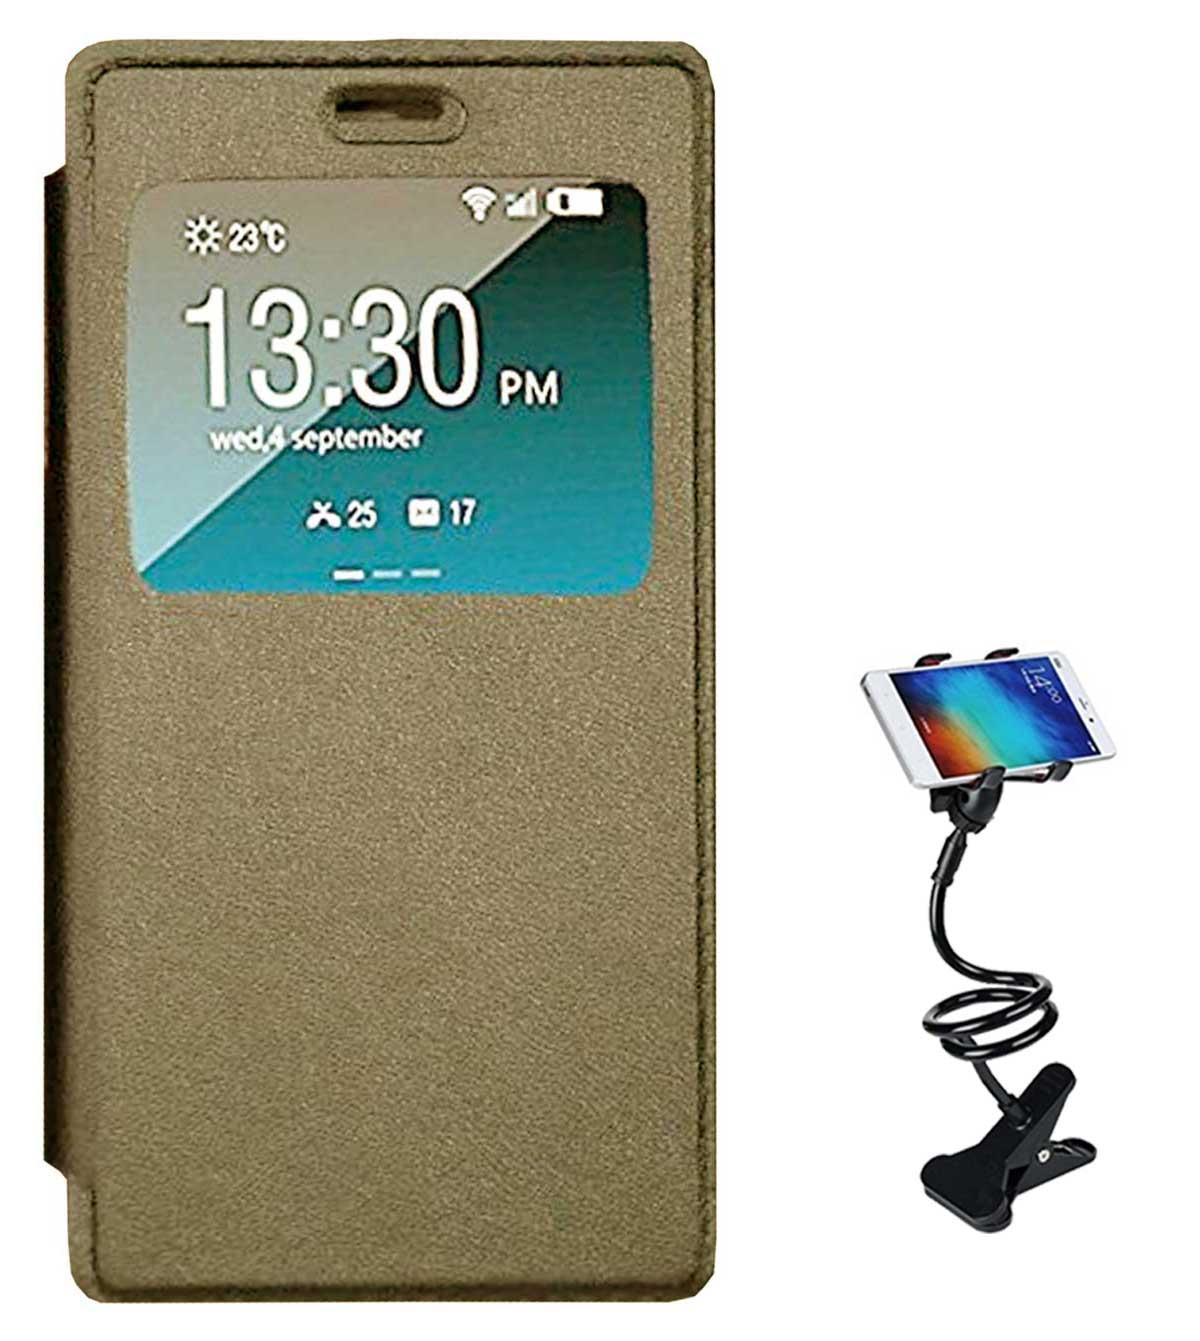 TBZ Window Premium Flip Cover Case for Vivo V5 with Flexible Tablet/Phone Holder Lazy Stand  Golden